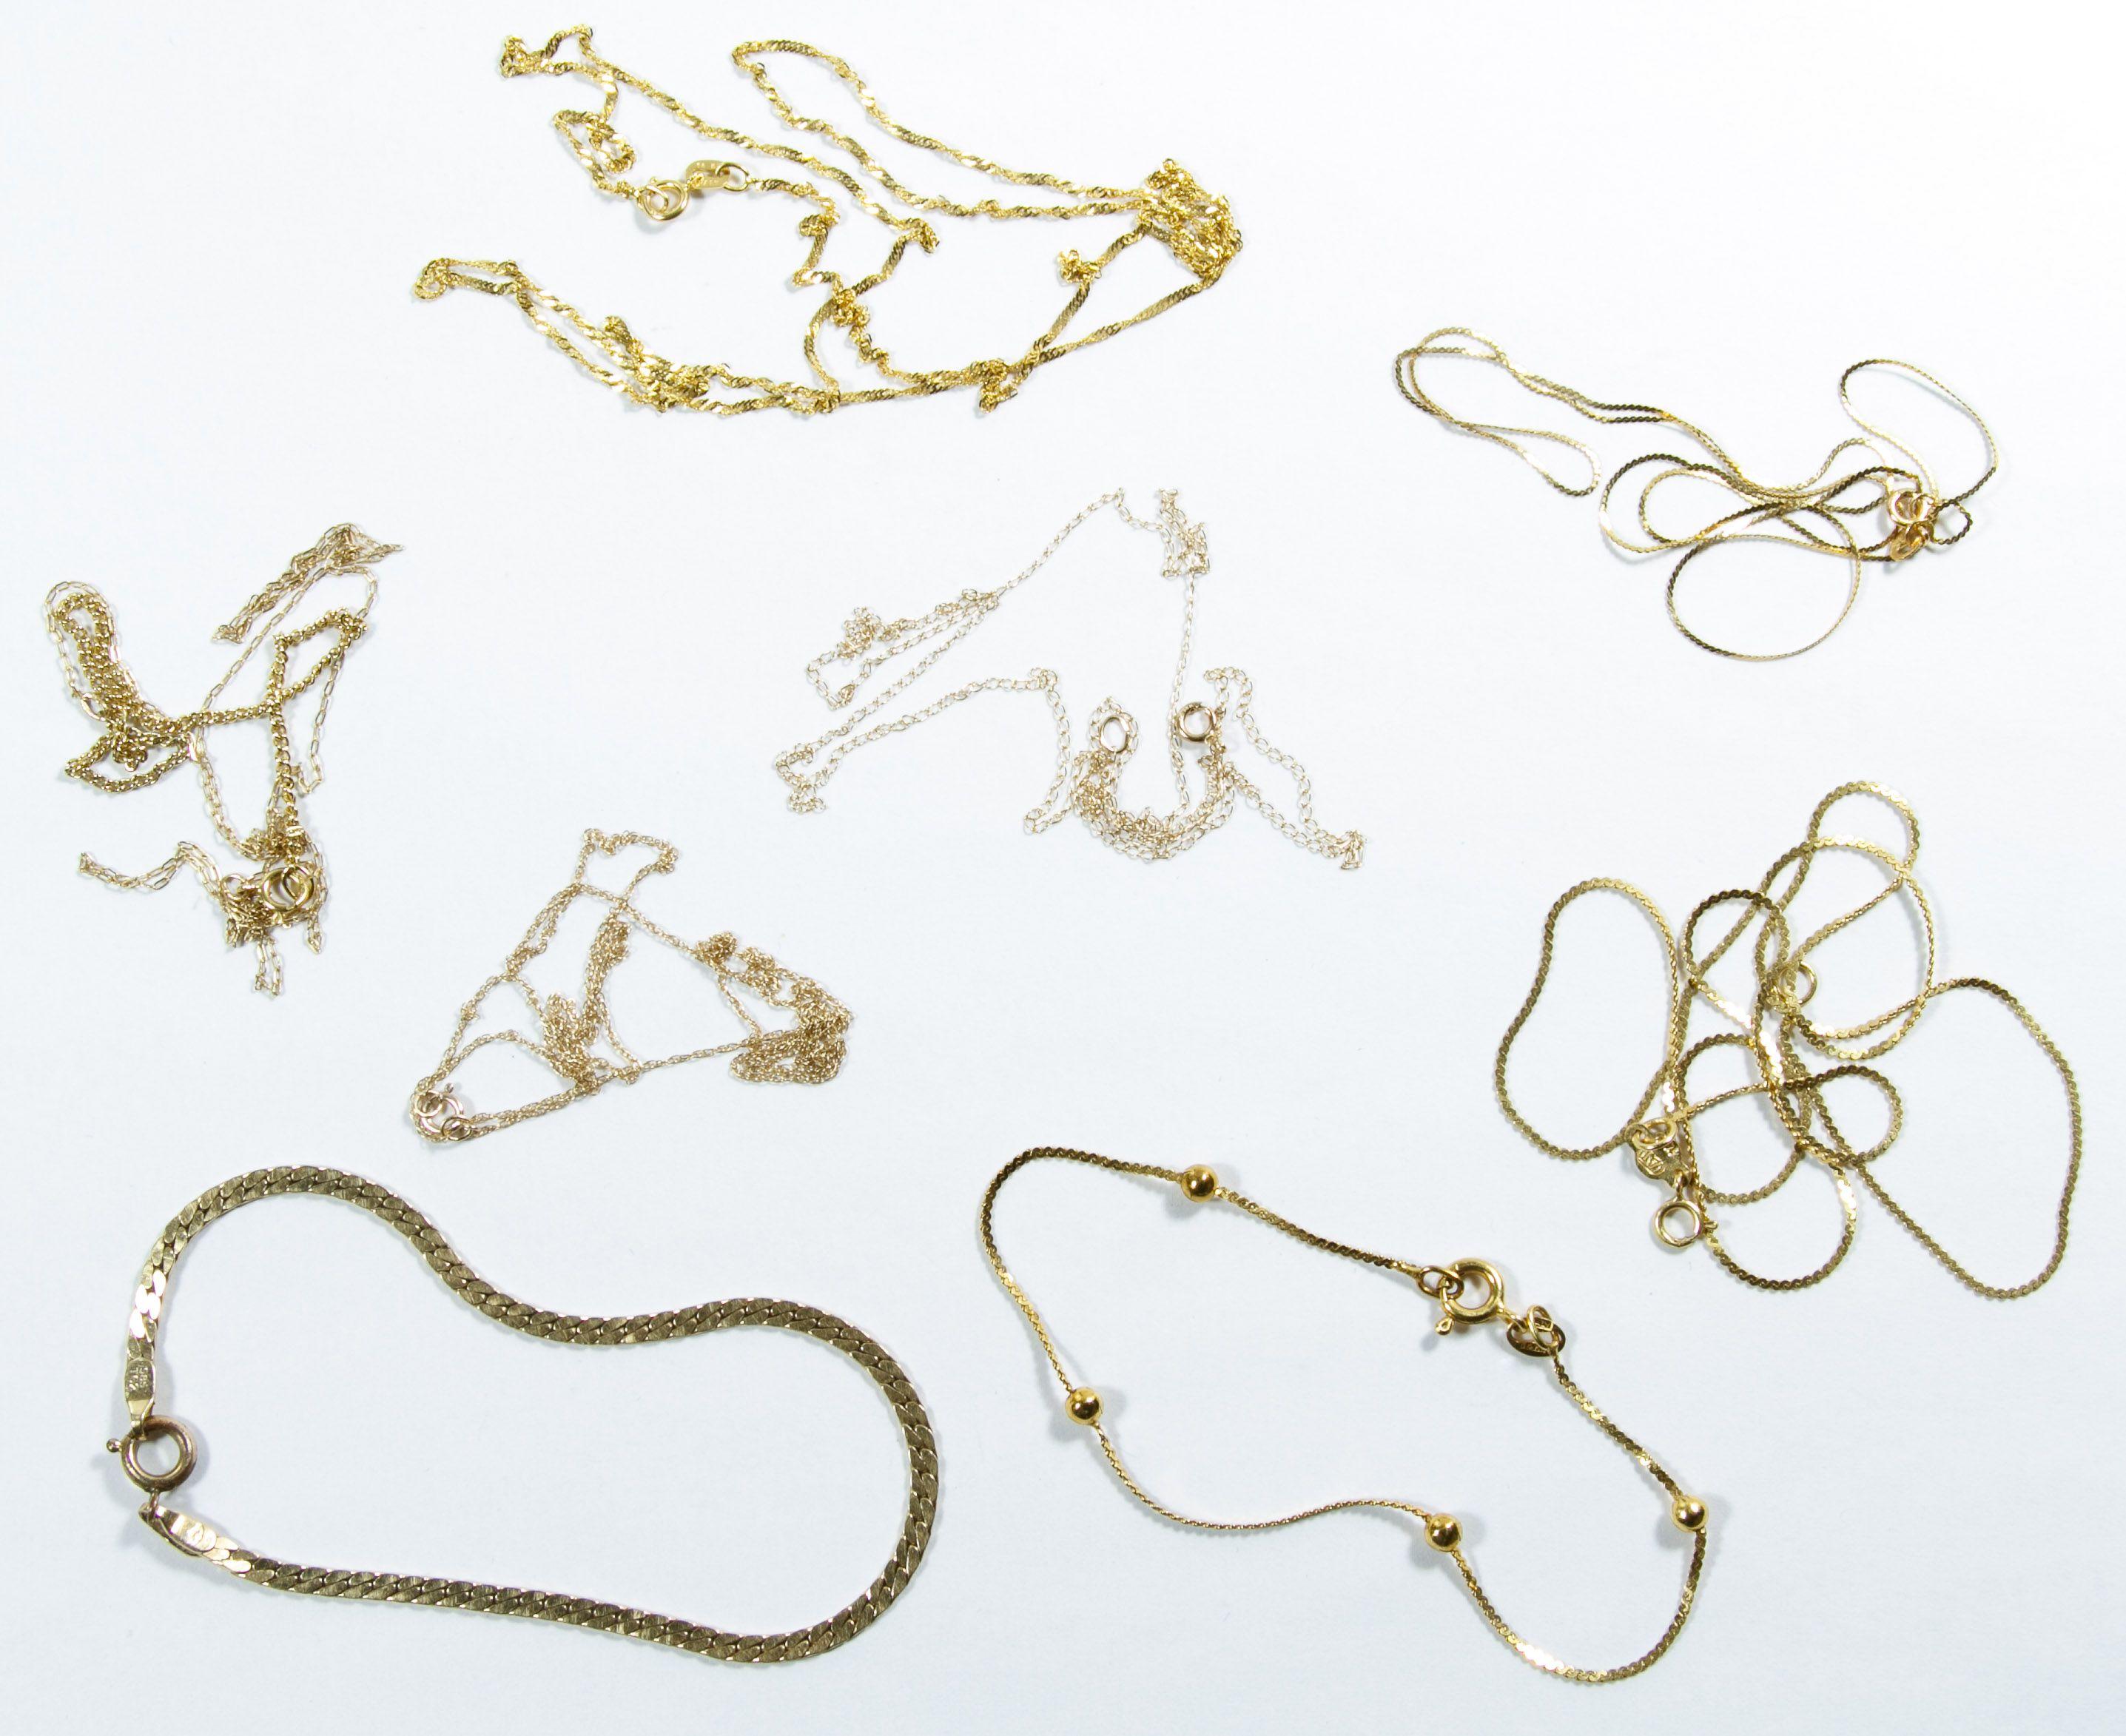 Lot 135: 14k Gold Necklace and Bracelet Assortment; Seven necklaces and two bracelets; each have stamped 14k gold marks